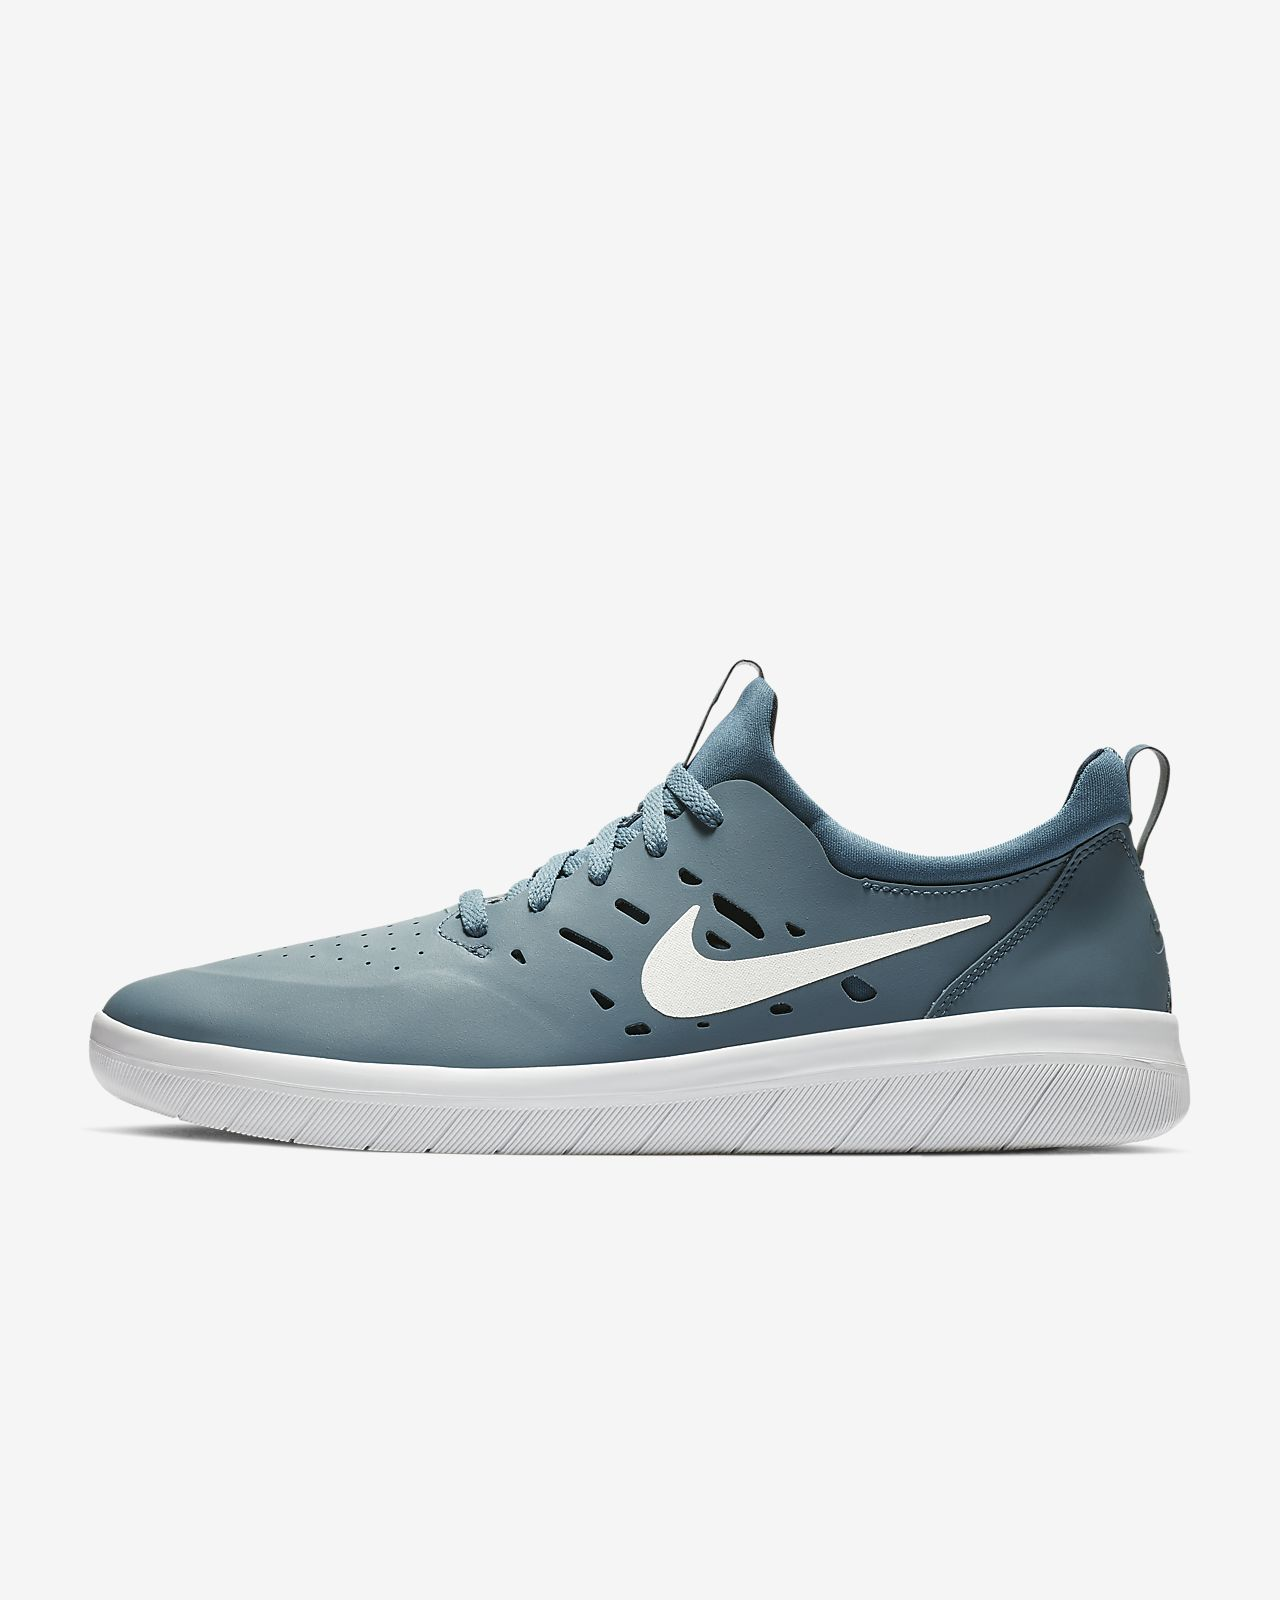 Pour Sb De Fr Nyjah Nike Skateboard Homme Chaussure wftq4XX